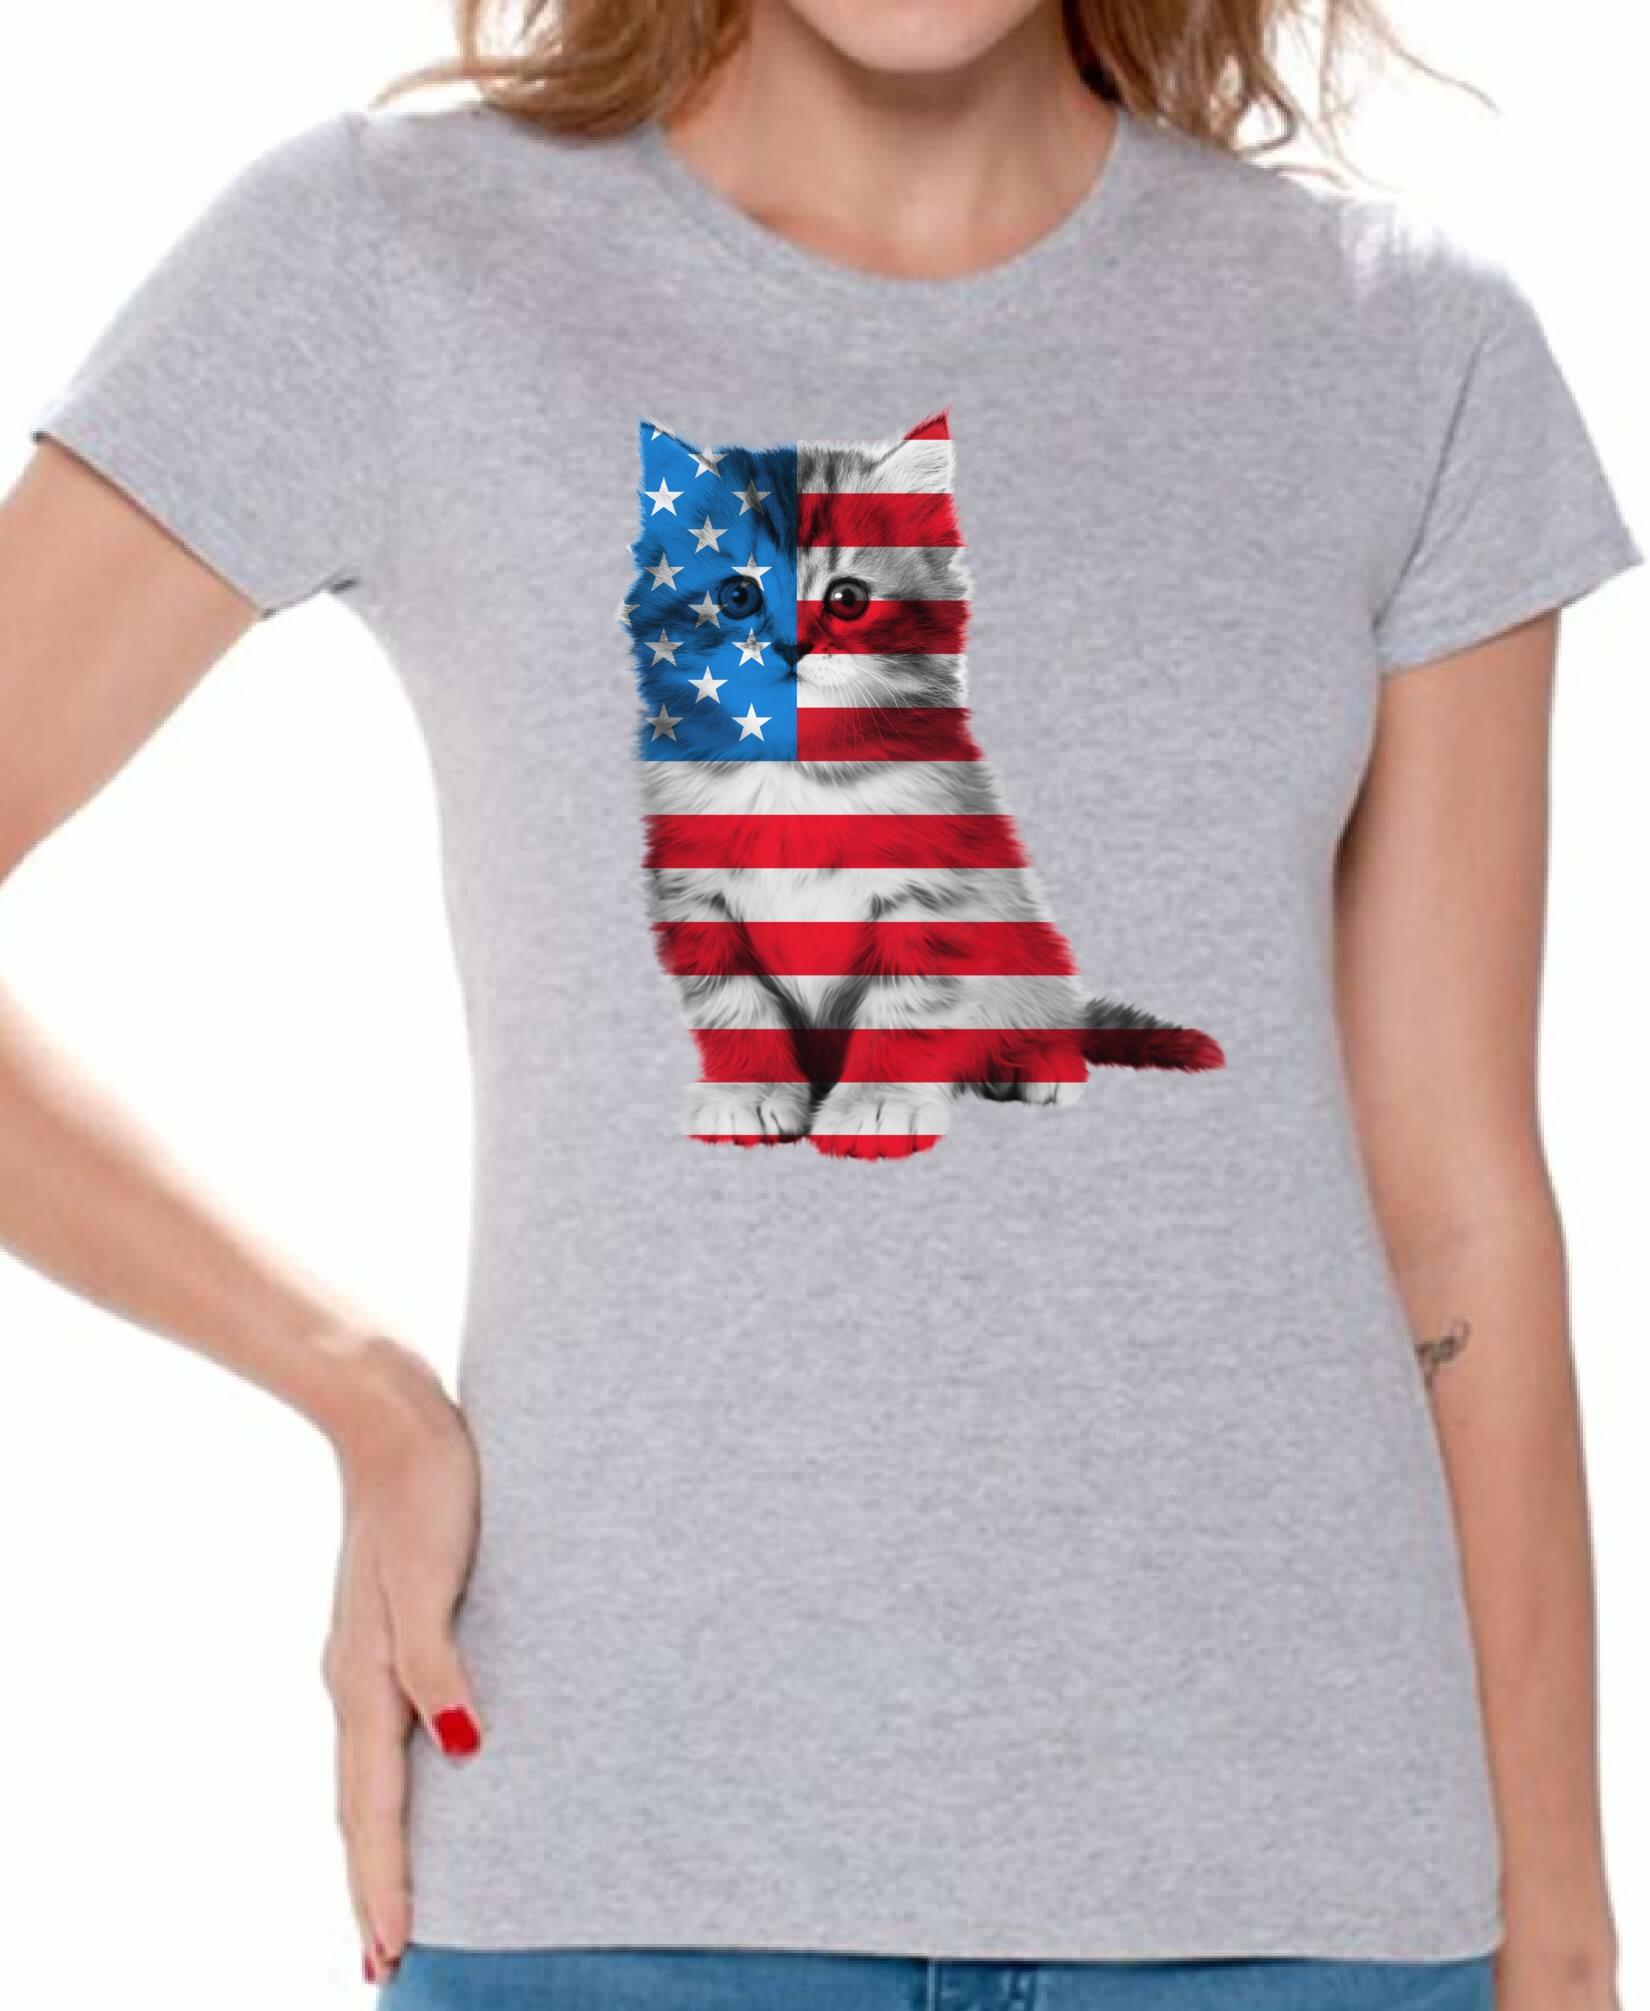 Usa Flag Cat Women 39 S T Shirt Tops Cute 4th Of July Gift